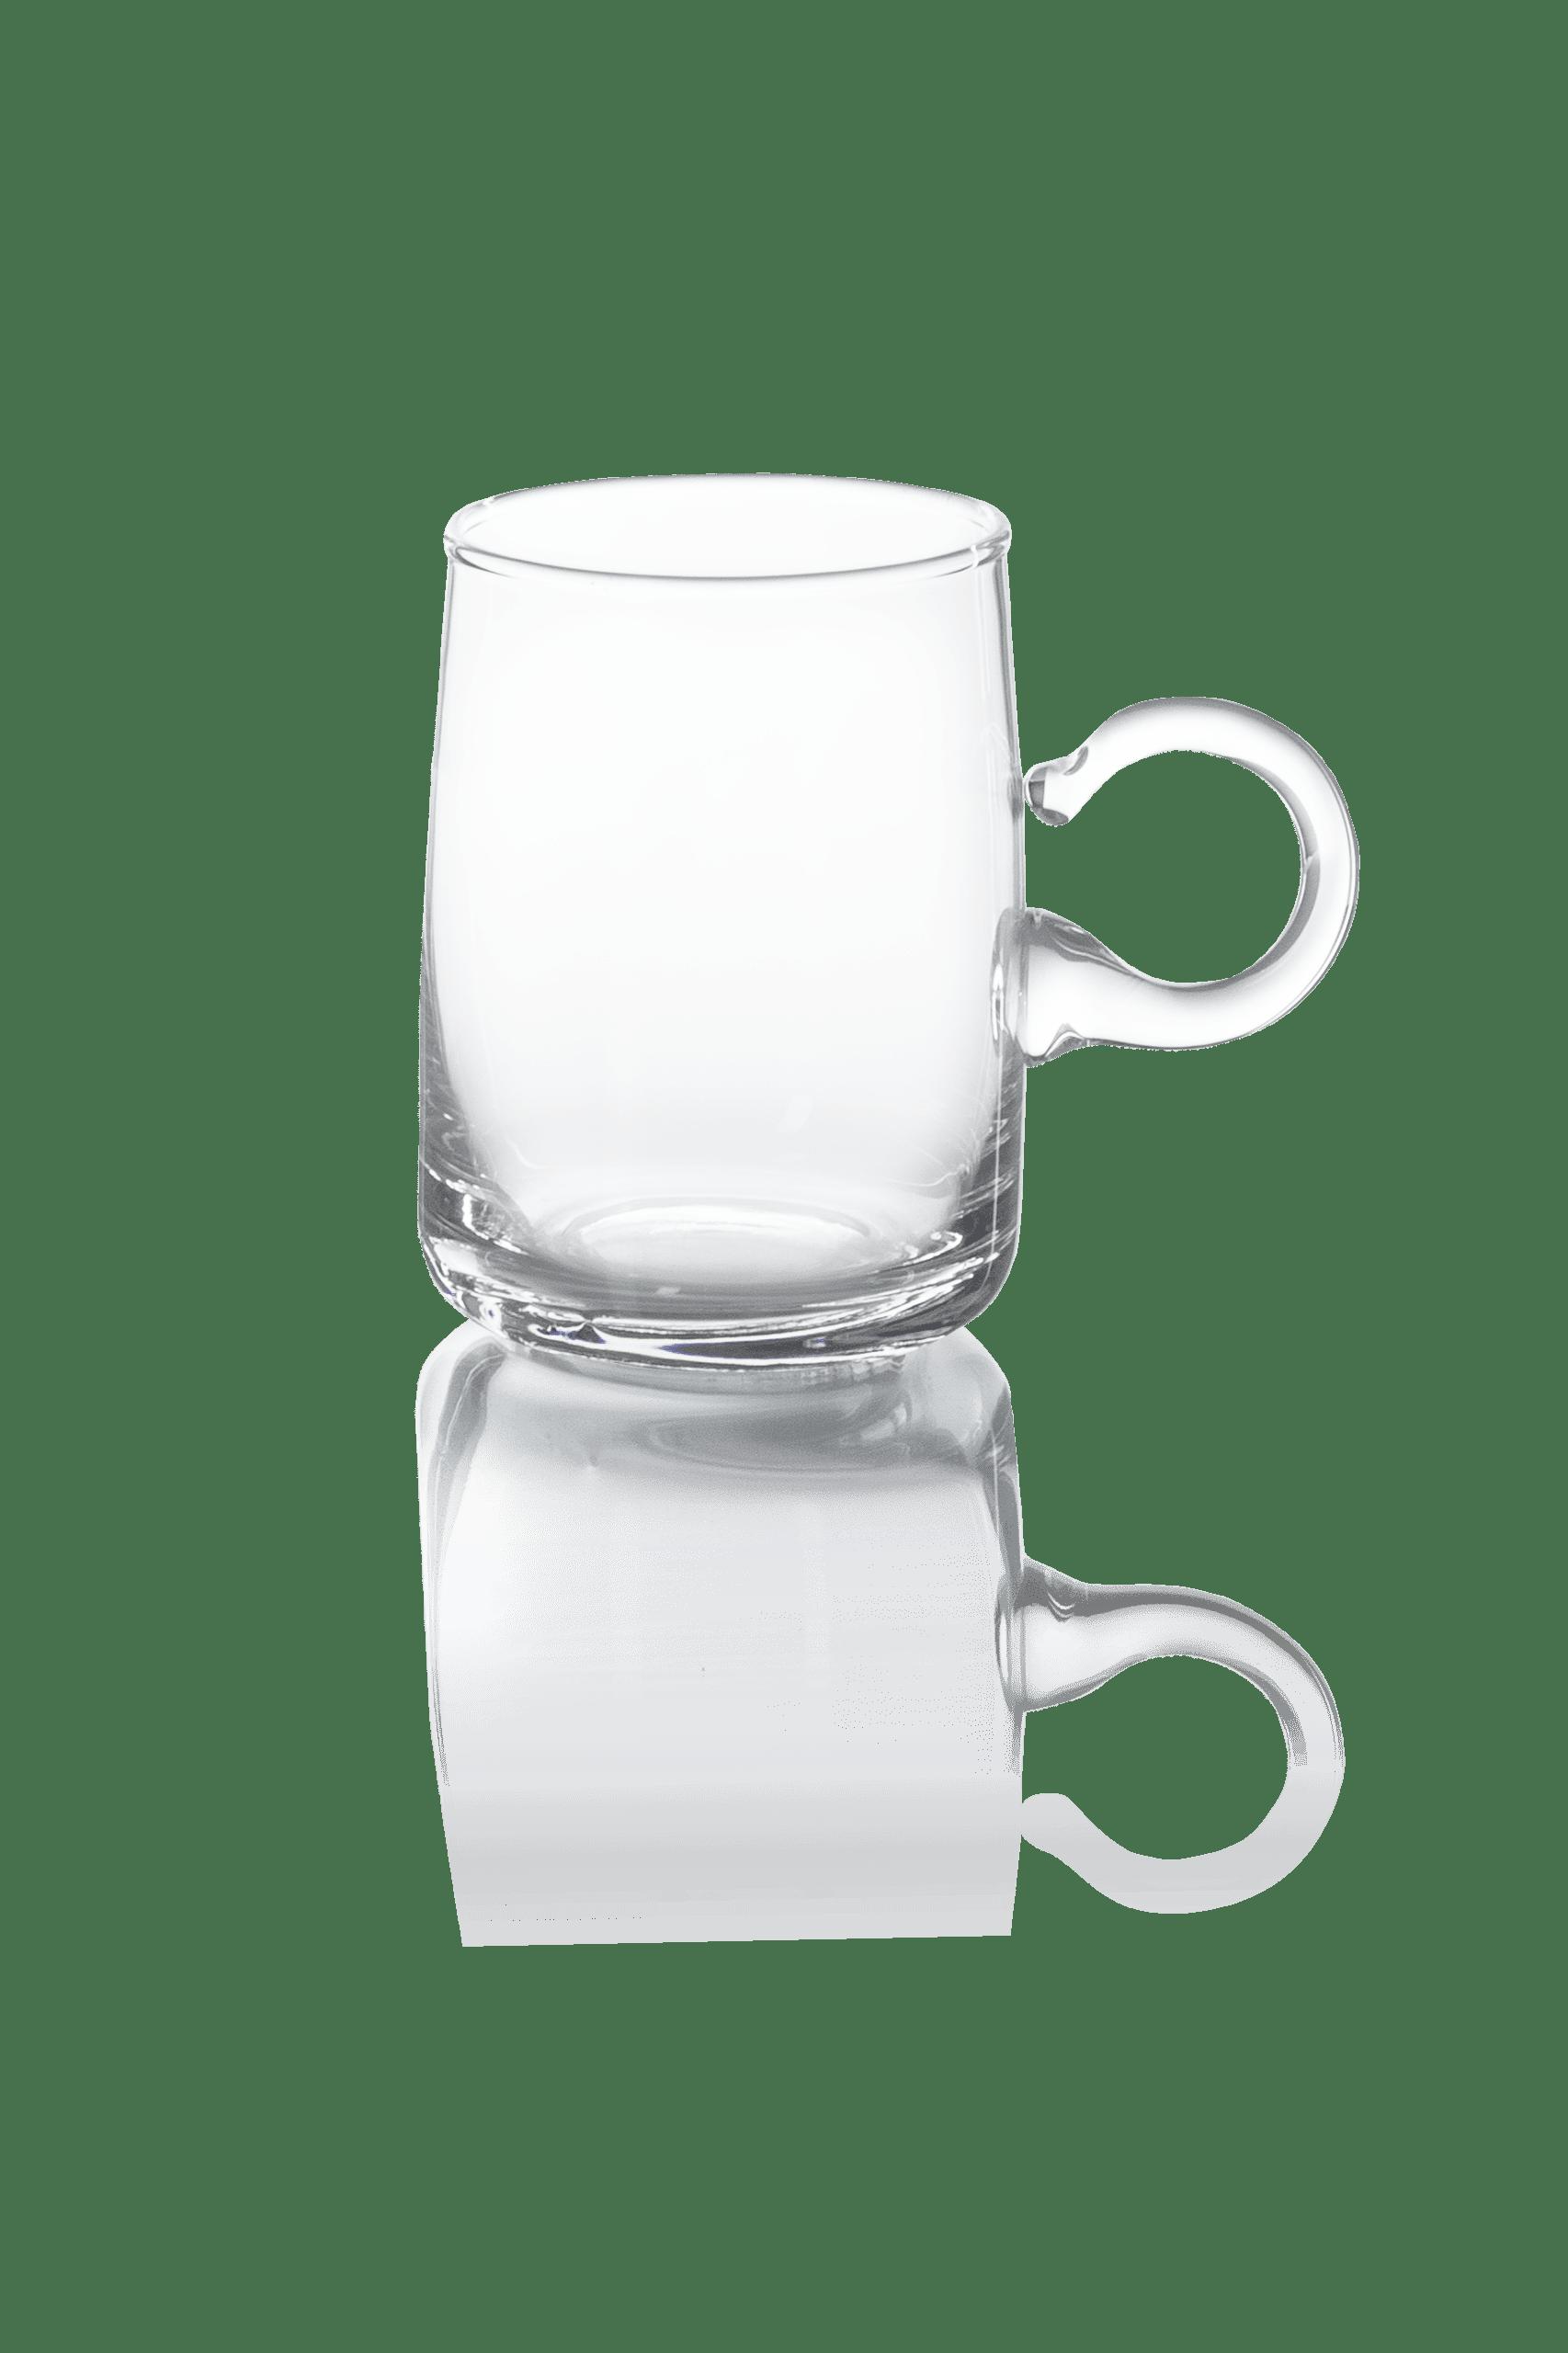 Szklanka z uchem do herbaty